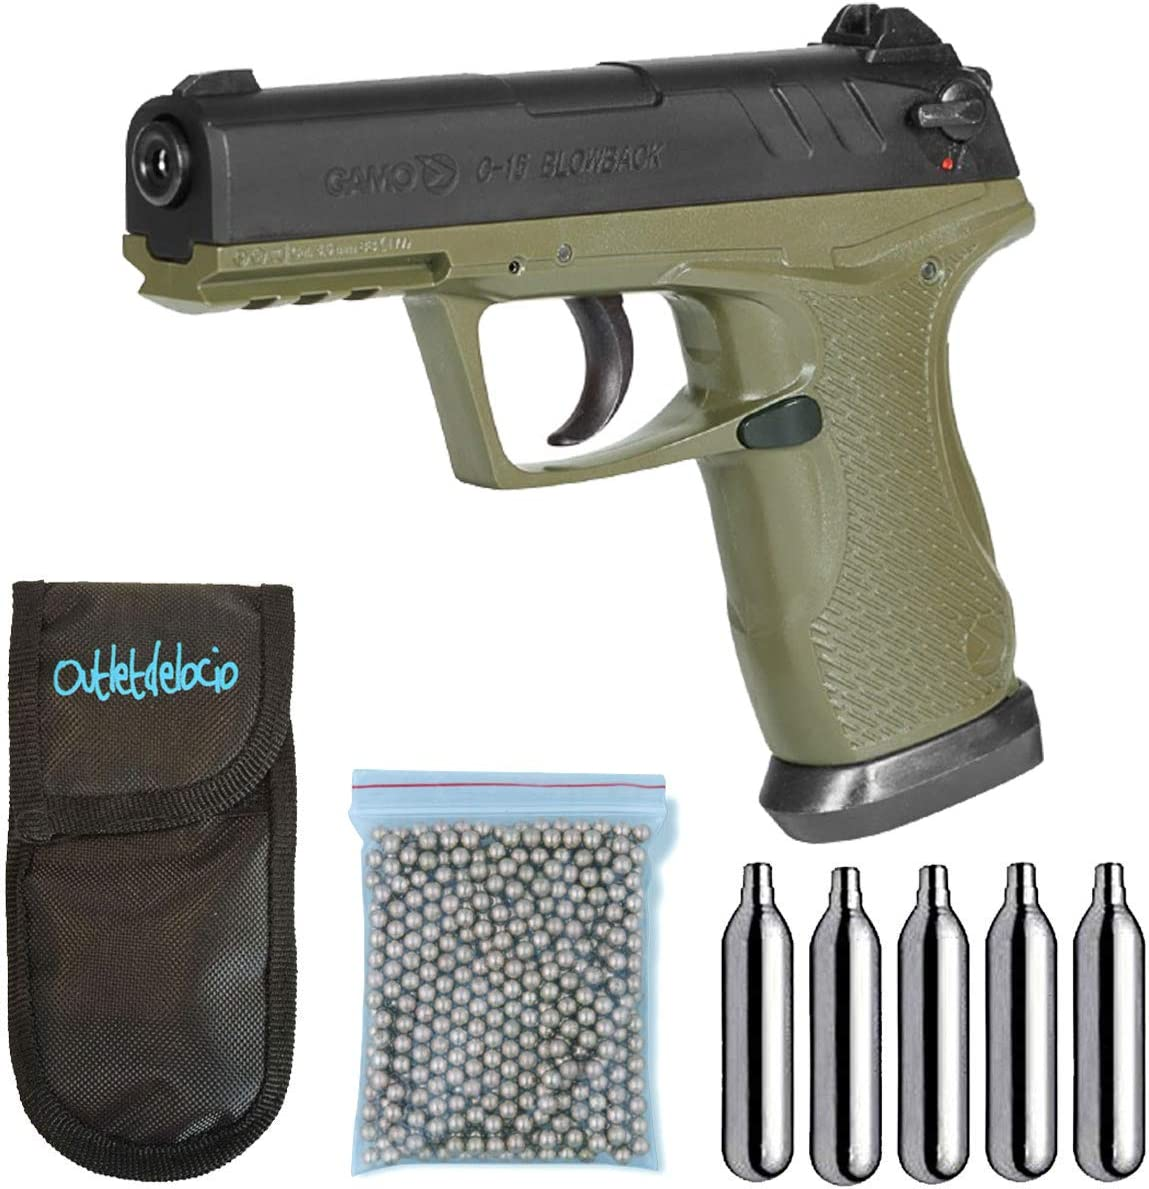 Outletdelocio. Pistola Perdigón Gamo C-15 Olive Drab 4,5mm Blowback. + Funda Portabombonas + Balines + Bombonas co2. 23054/29318/38123